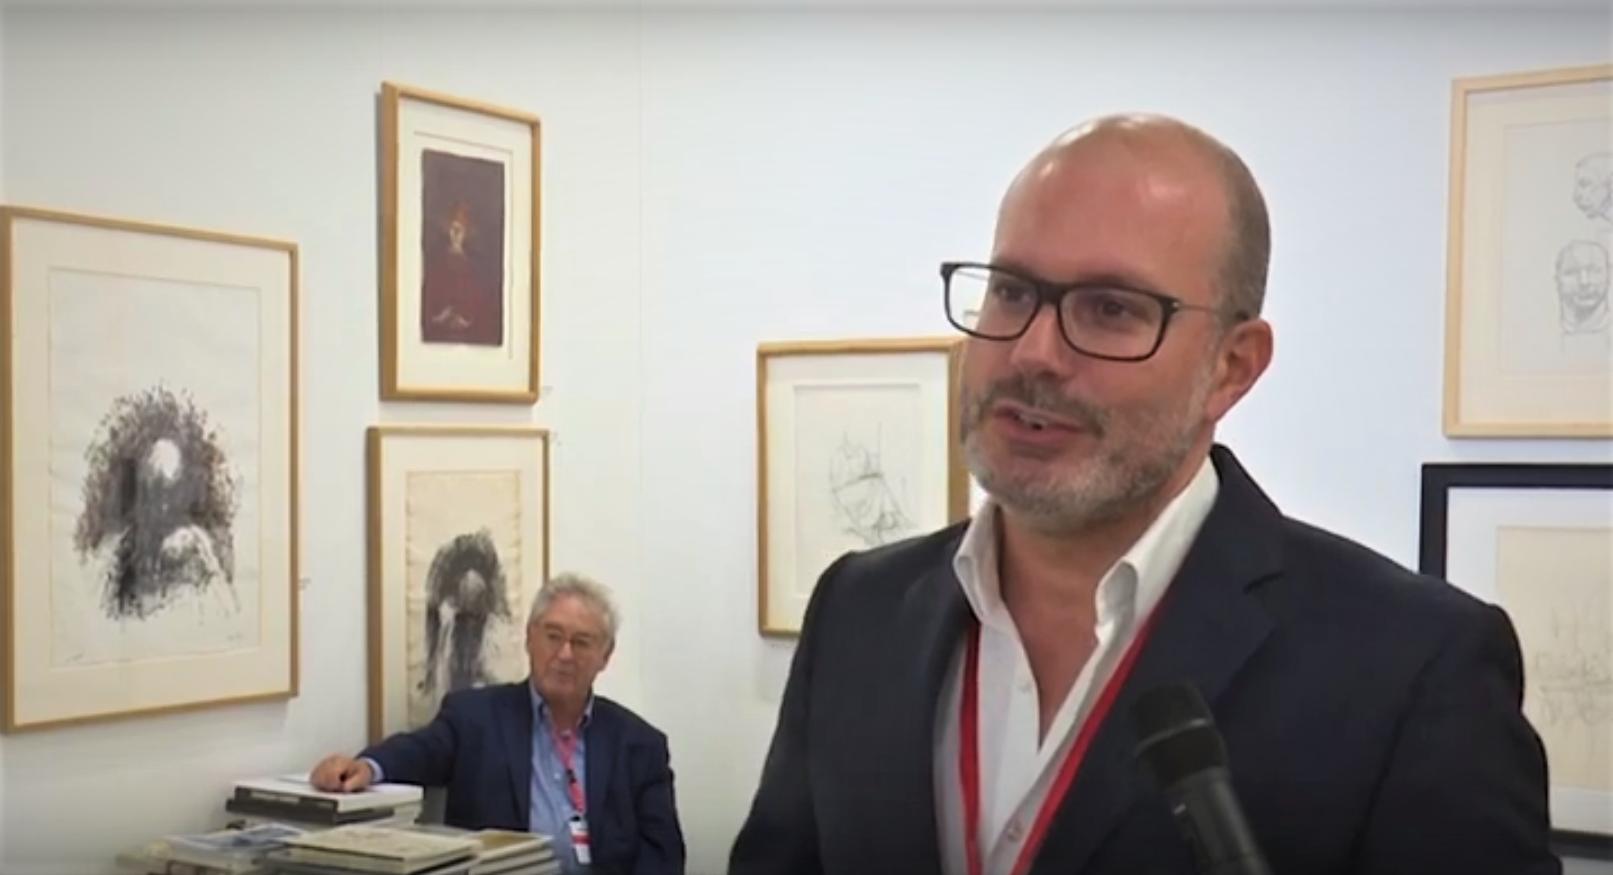 Il successo di WopArt 2019. Le gallerie si presentano: Ditesheim & Maffei, Kromya, dip, VitArt